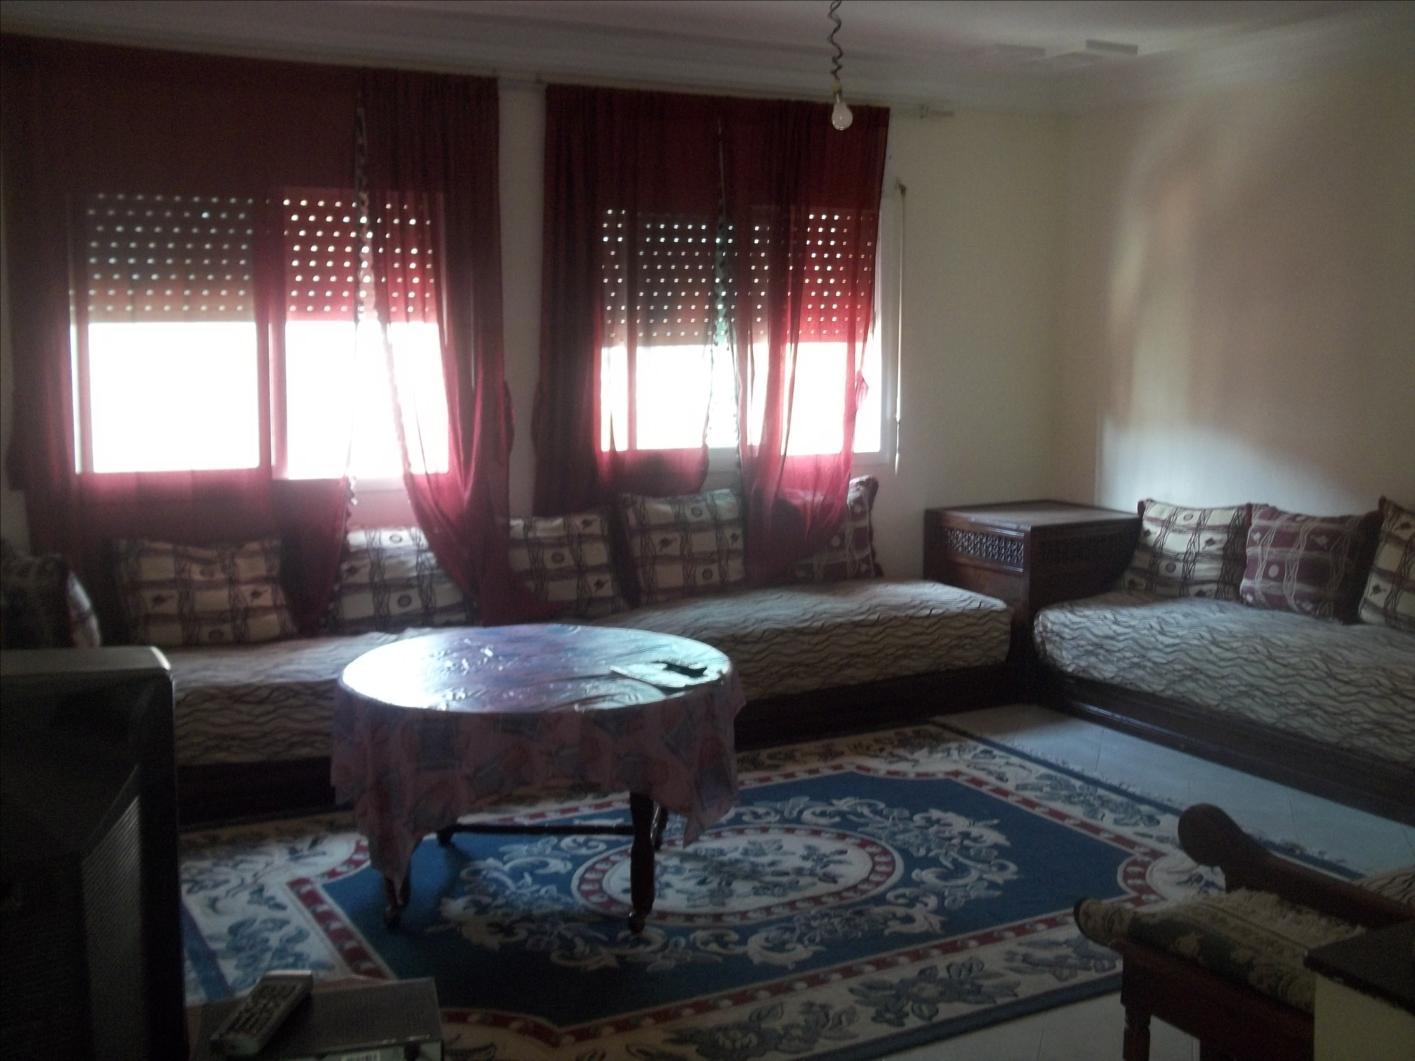 Location Appartement  Kenitra Maroc mehdia Appartement  louer  Kenitra pas cher